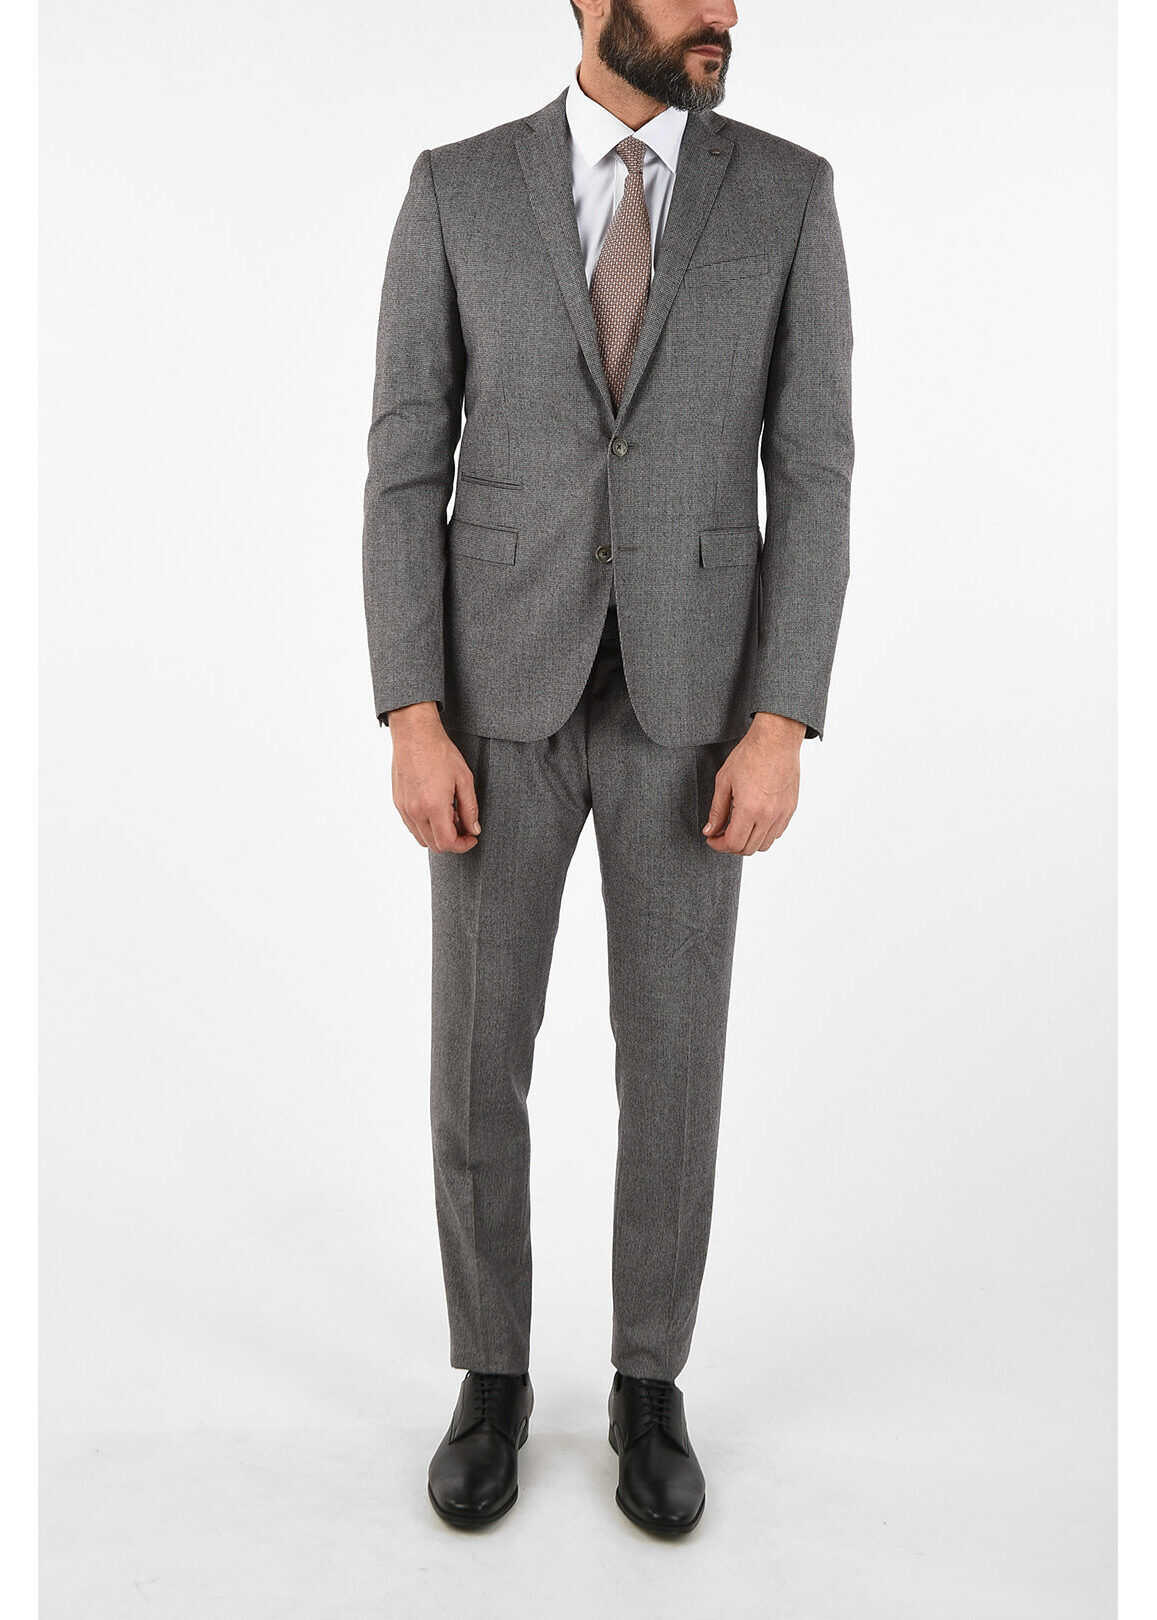 CORNELIANI CC COLLECTION RESET houndstooth virgin wool drop 8R suit GRAY imagine